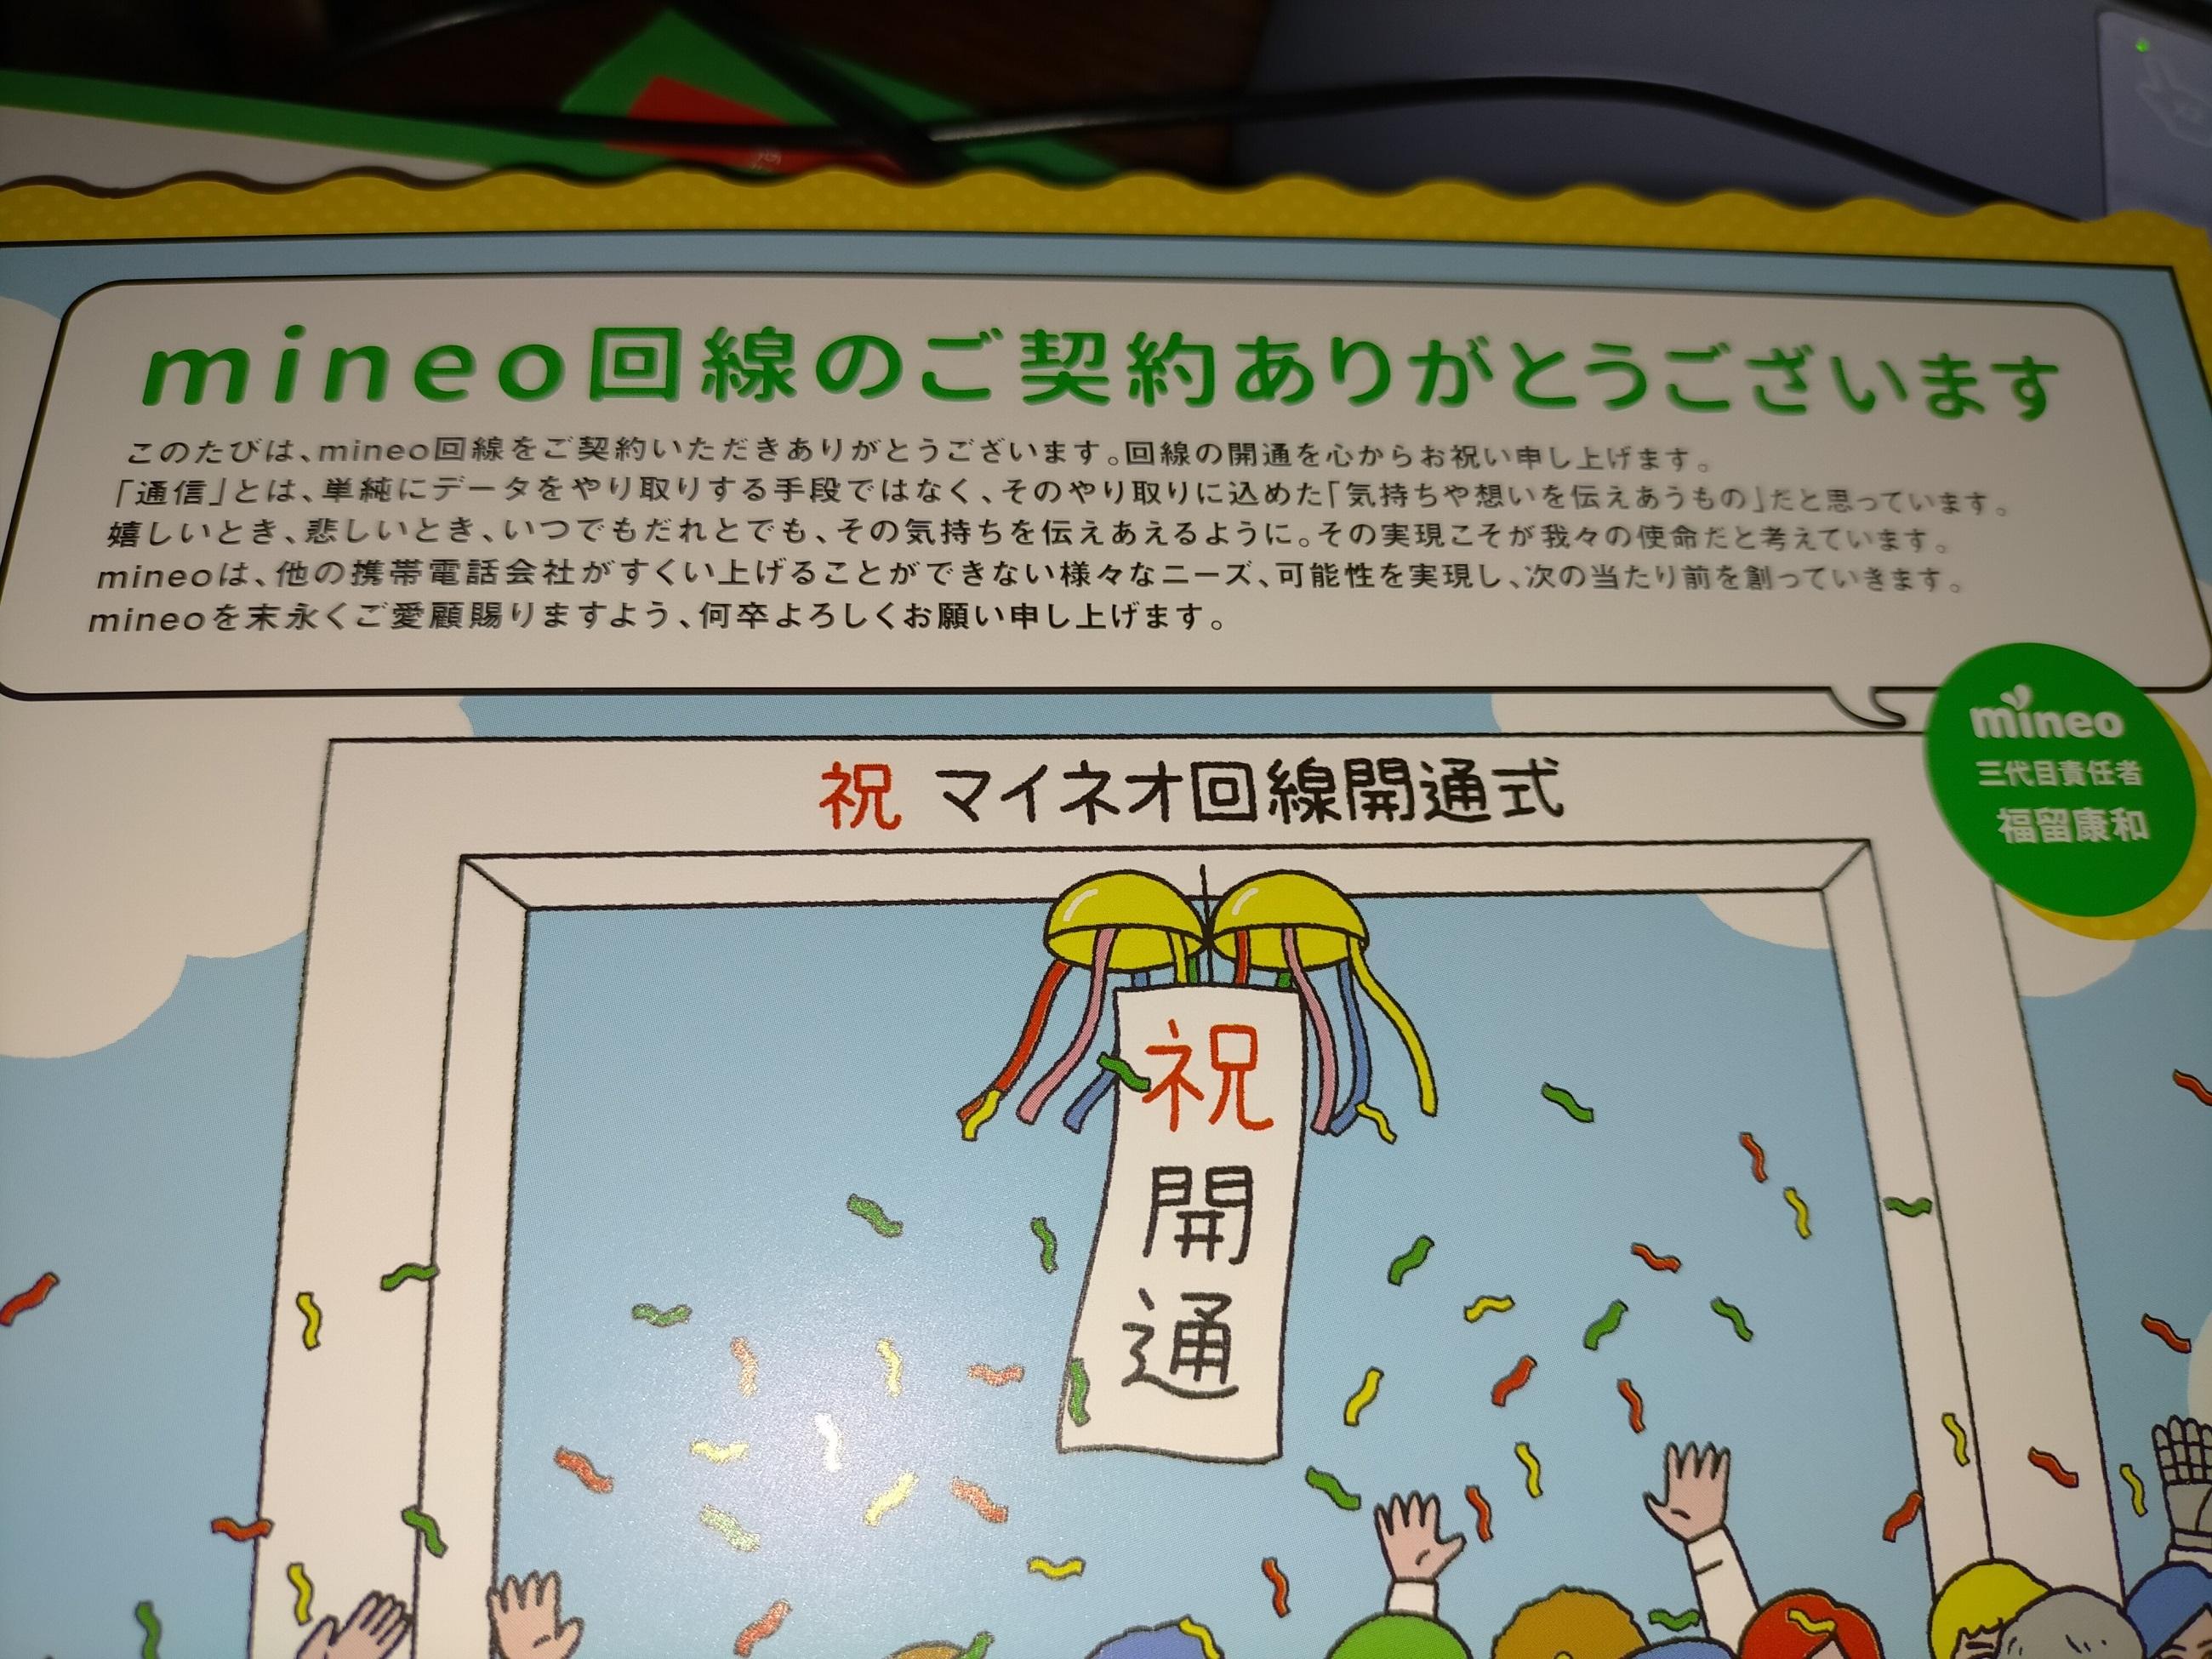 mineo_sim_card_new_3.jpg